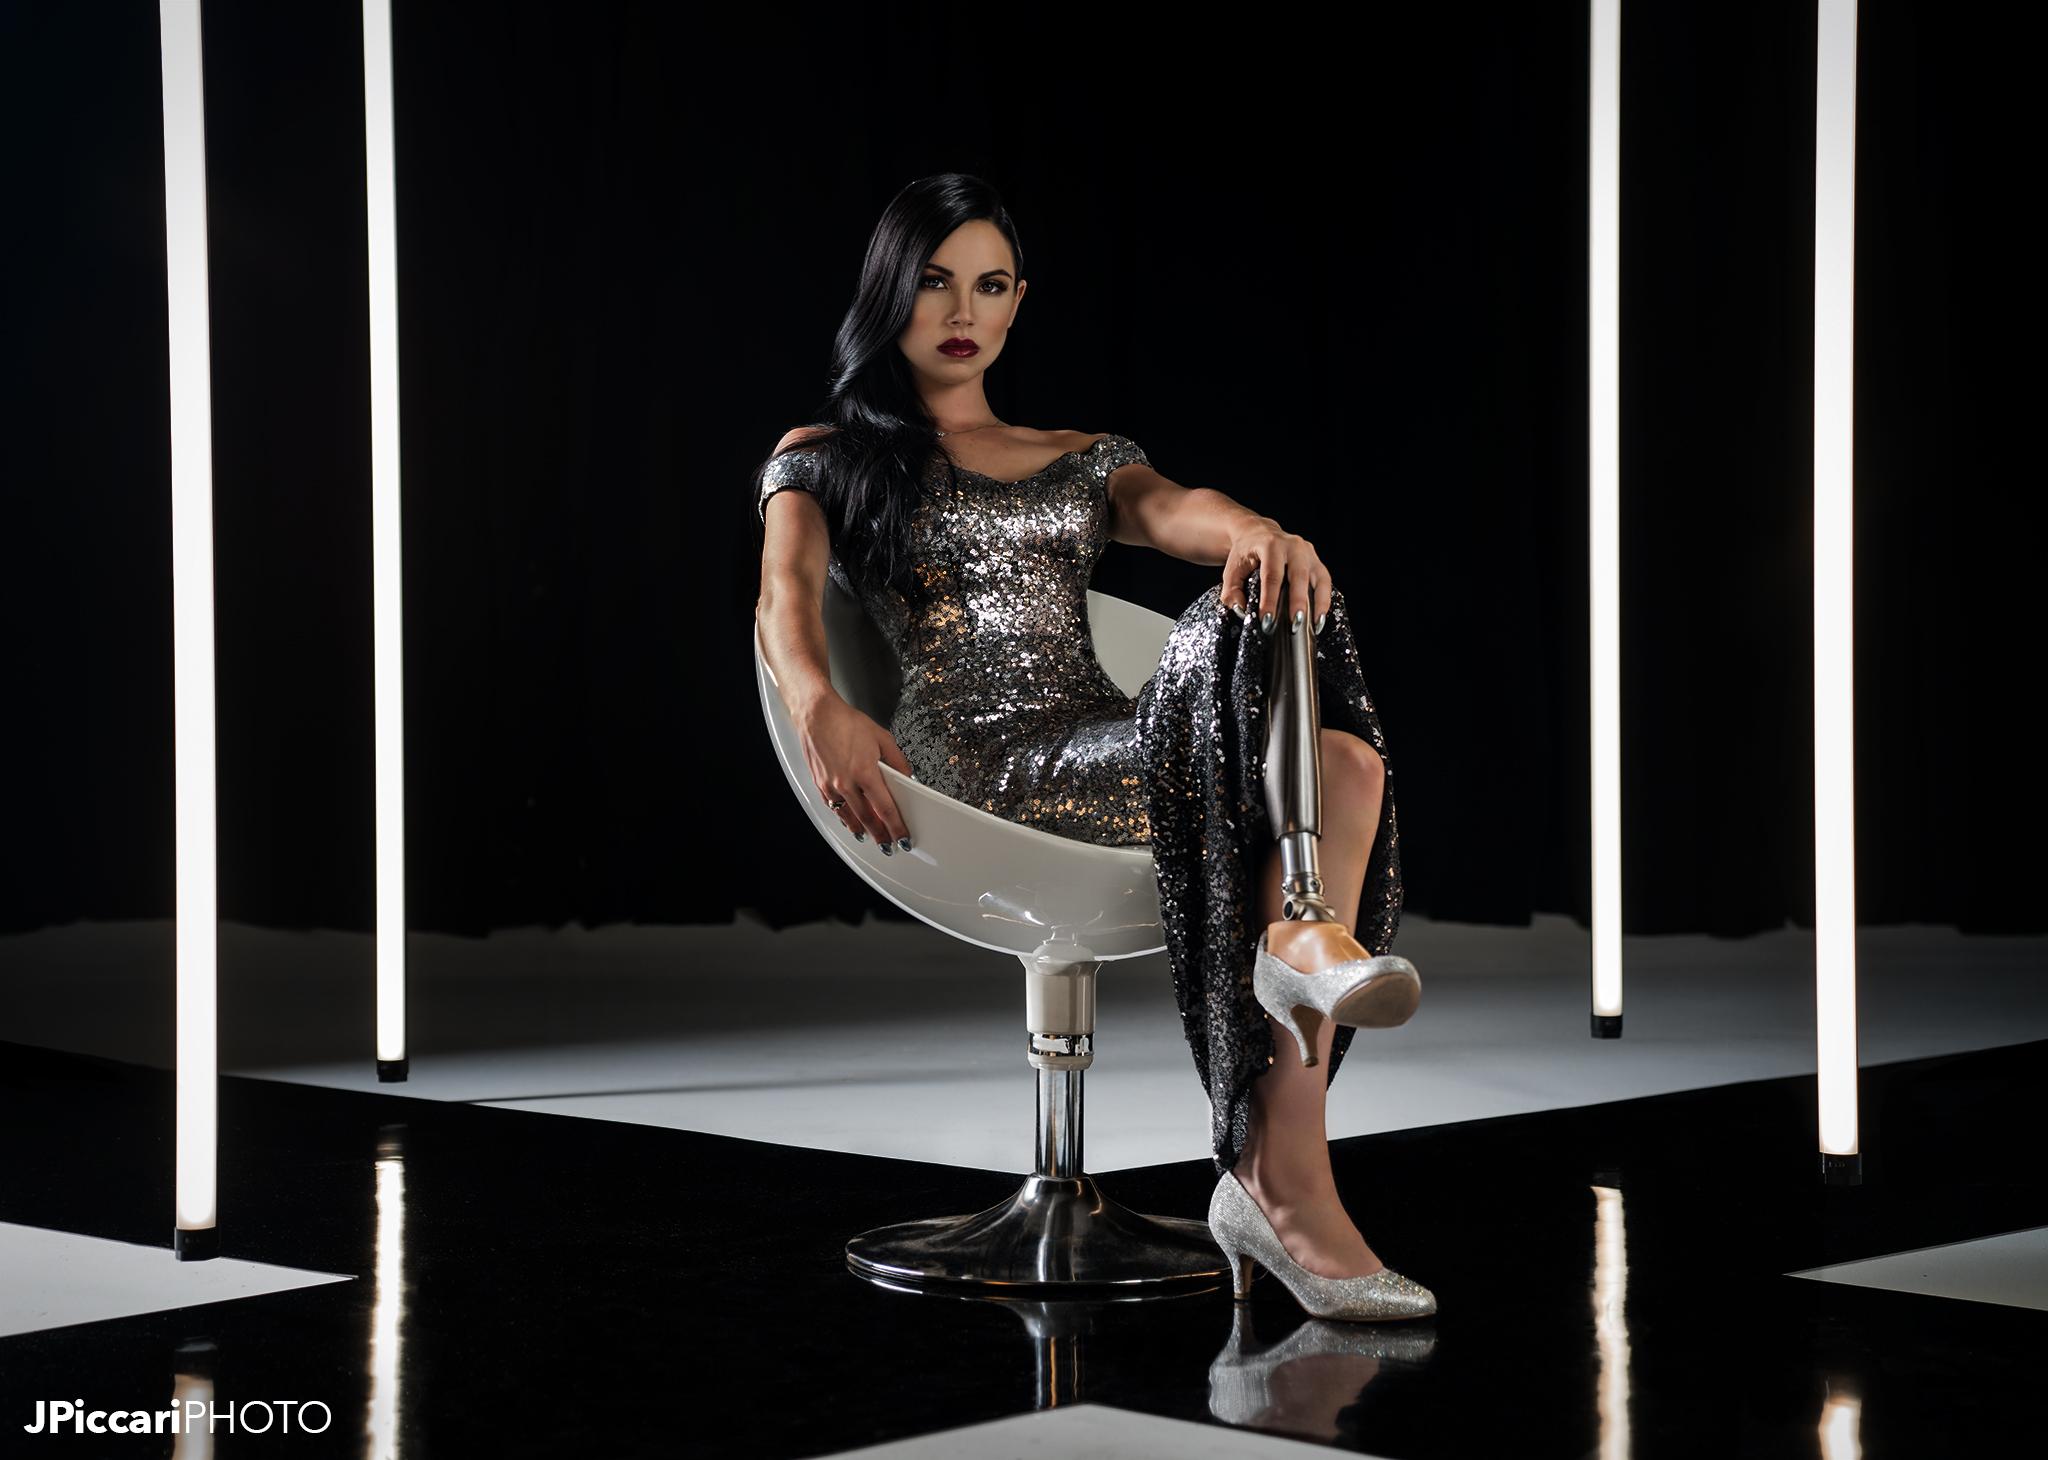 Xoe Xapoian wears Dalia MacPhee